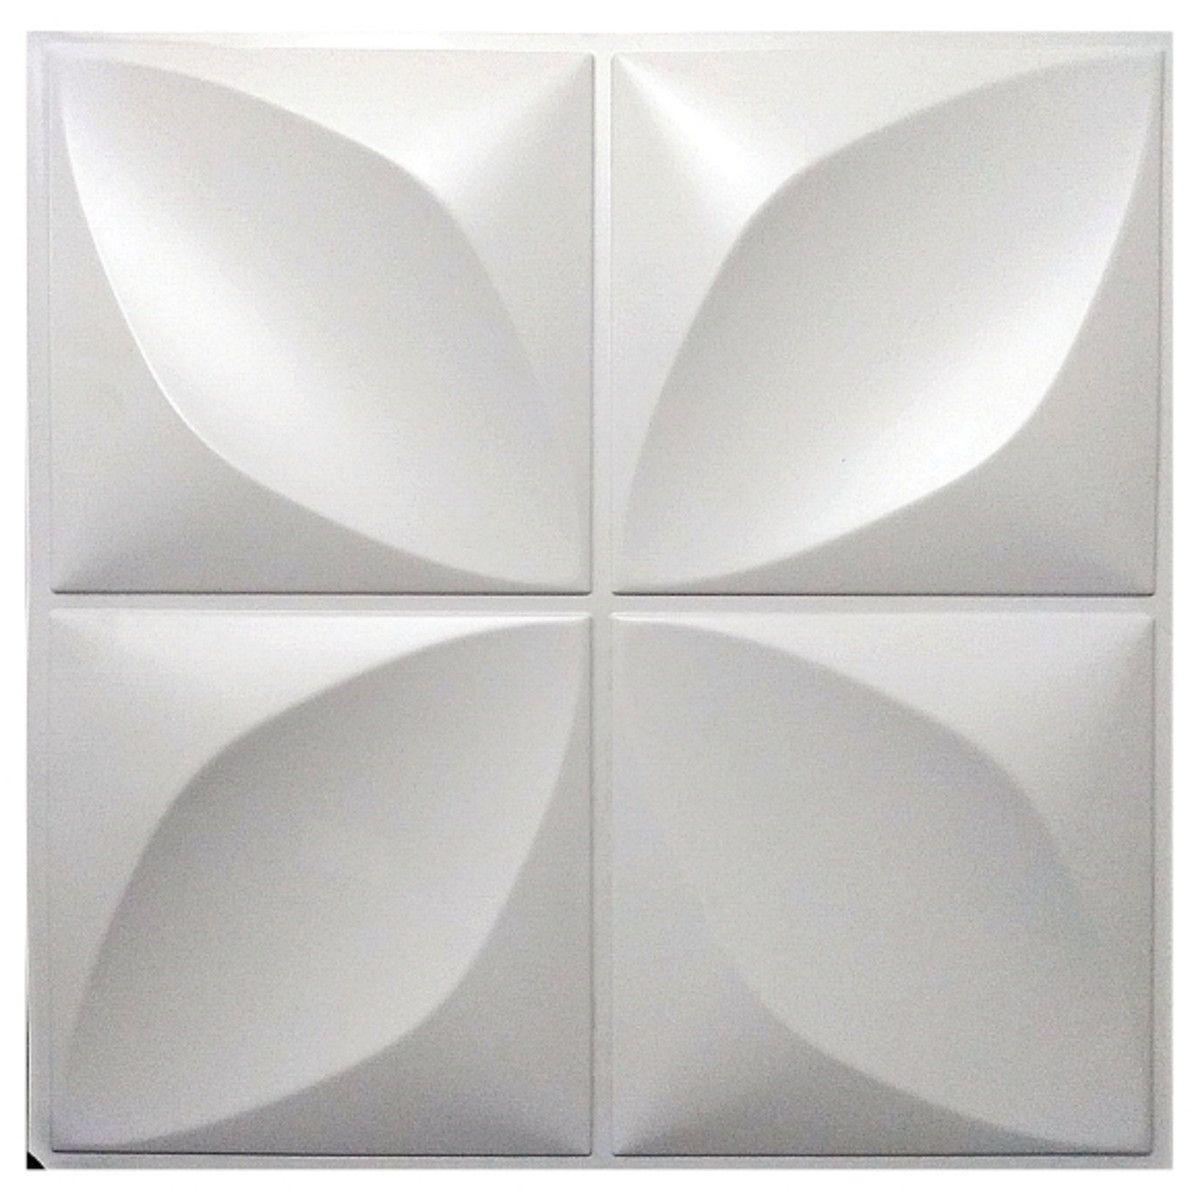 Placa 3D Autoadesiva Revestimento Premium Pétala 0,50 x 0,50cm